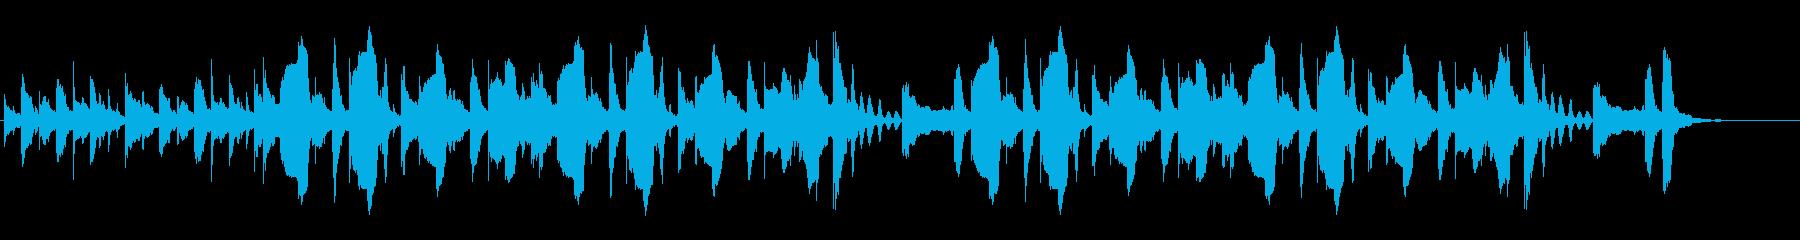 Innocent Clarinetの再生済みの波形